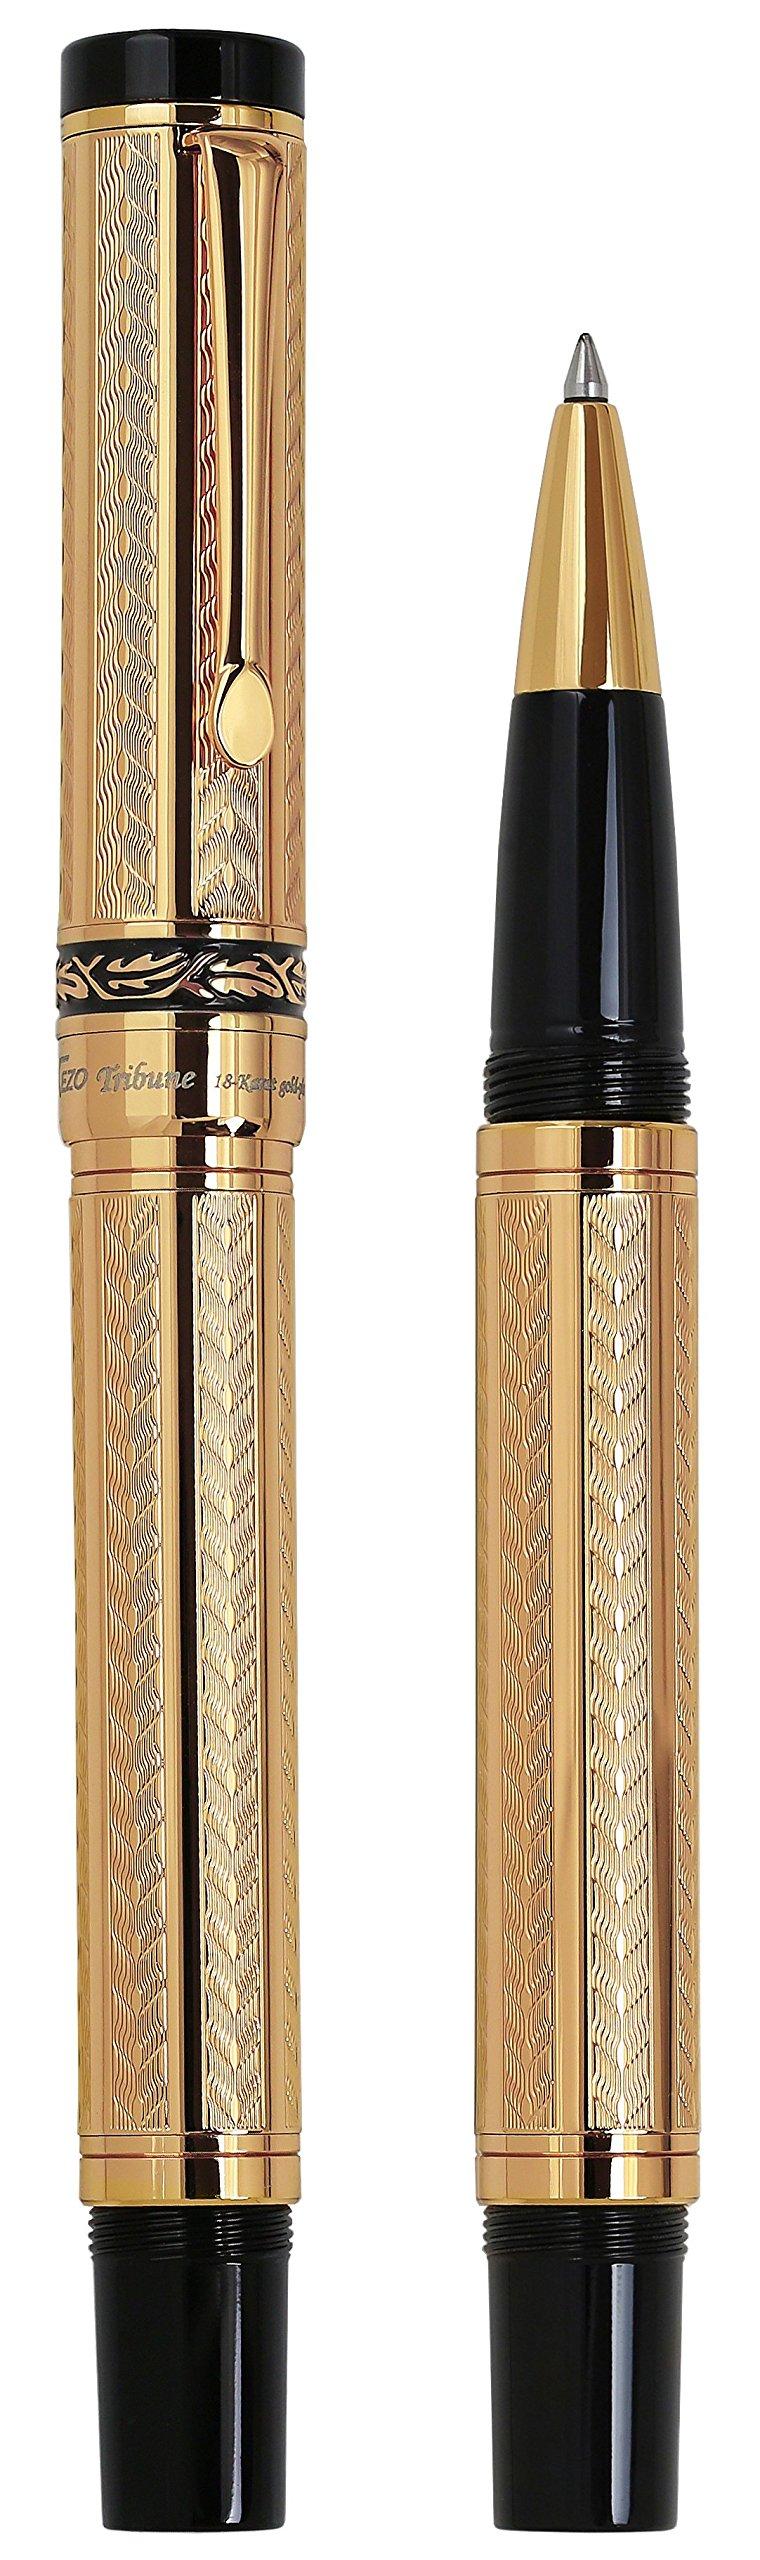 Xezo Diamond-Cut 18-Karat Gold Layered Weighty Fine Rollerball Pen. Screw-on cap (Tribune Gold RG) by Xezo (Image #2)